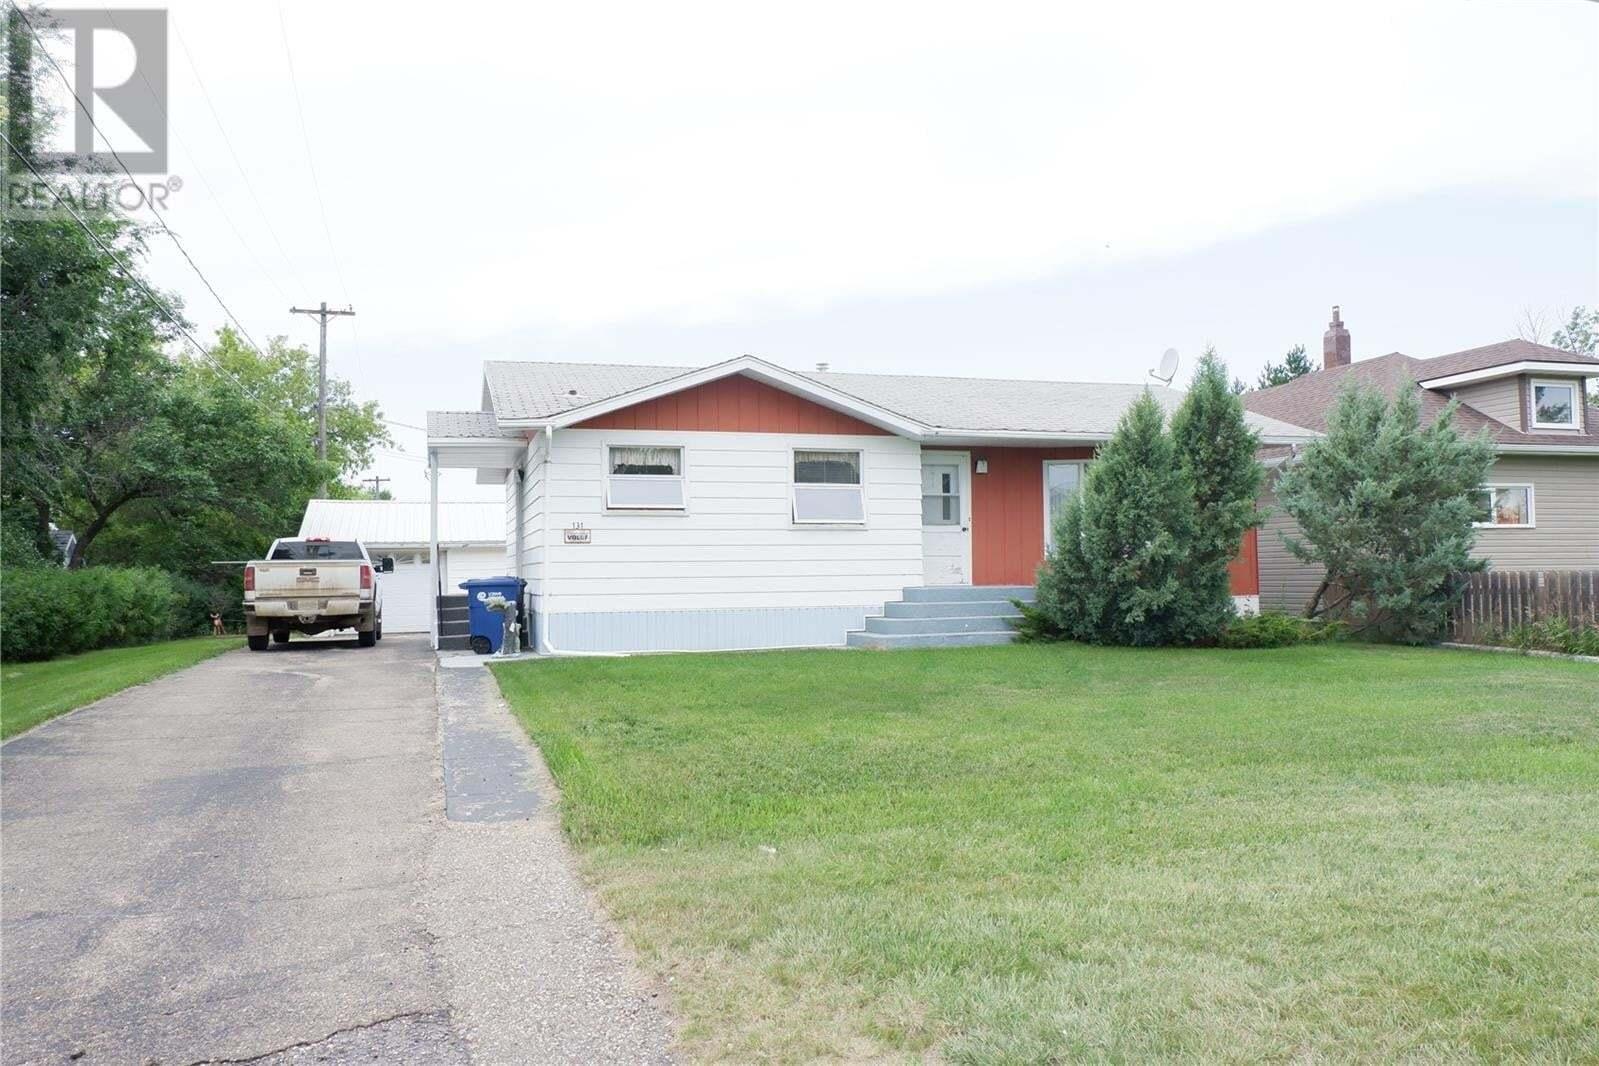 House for sale at 131 1st St W Bengough Saskatchewan - MLS: SK819450